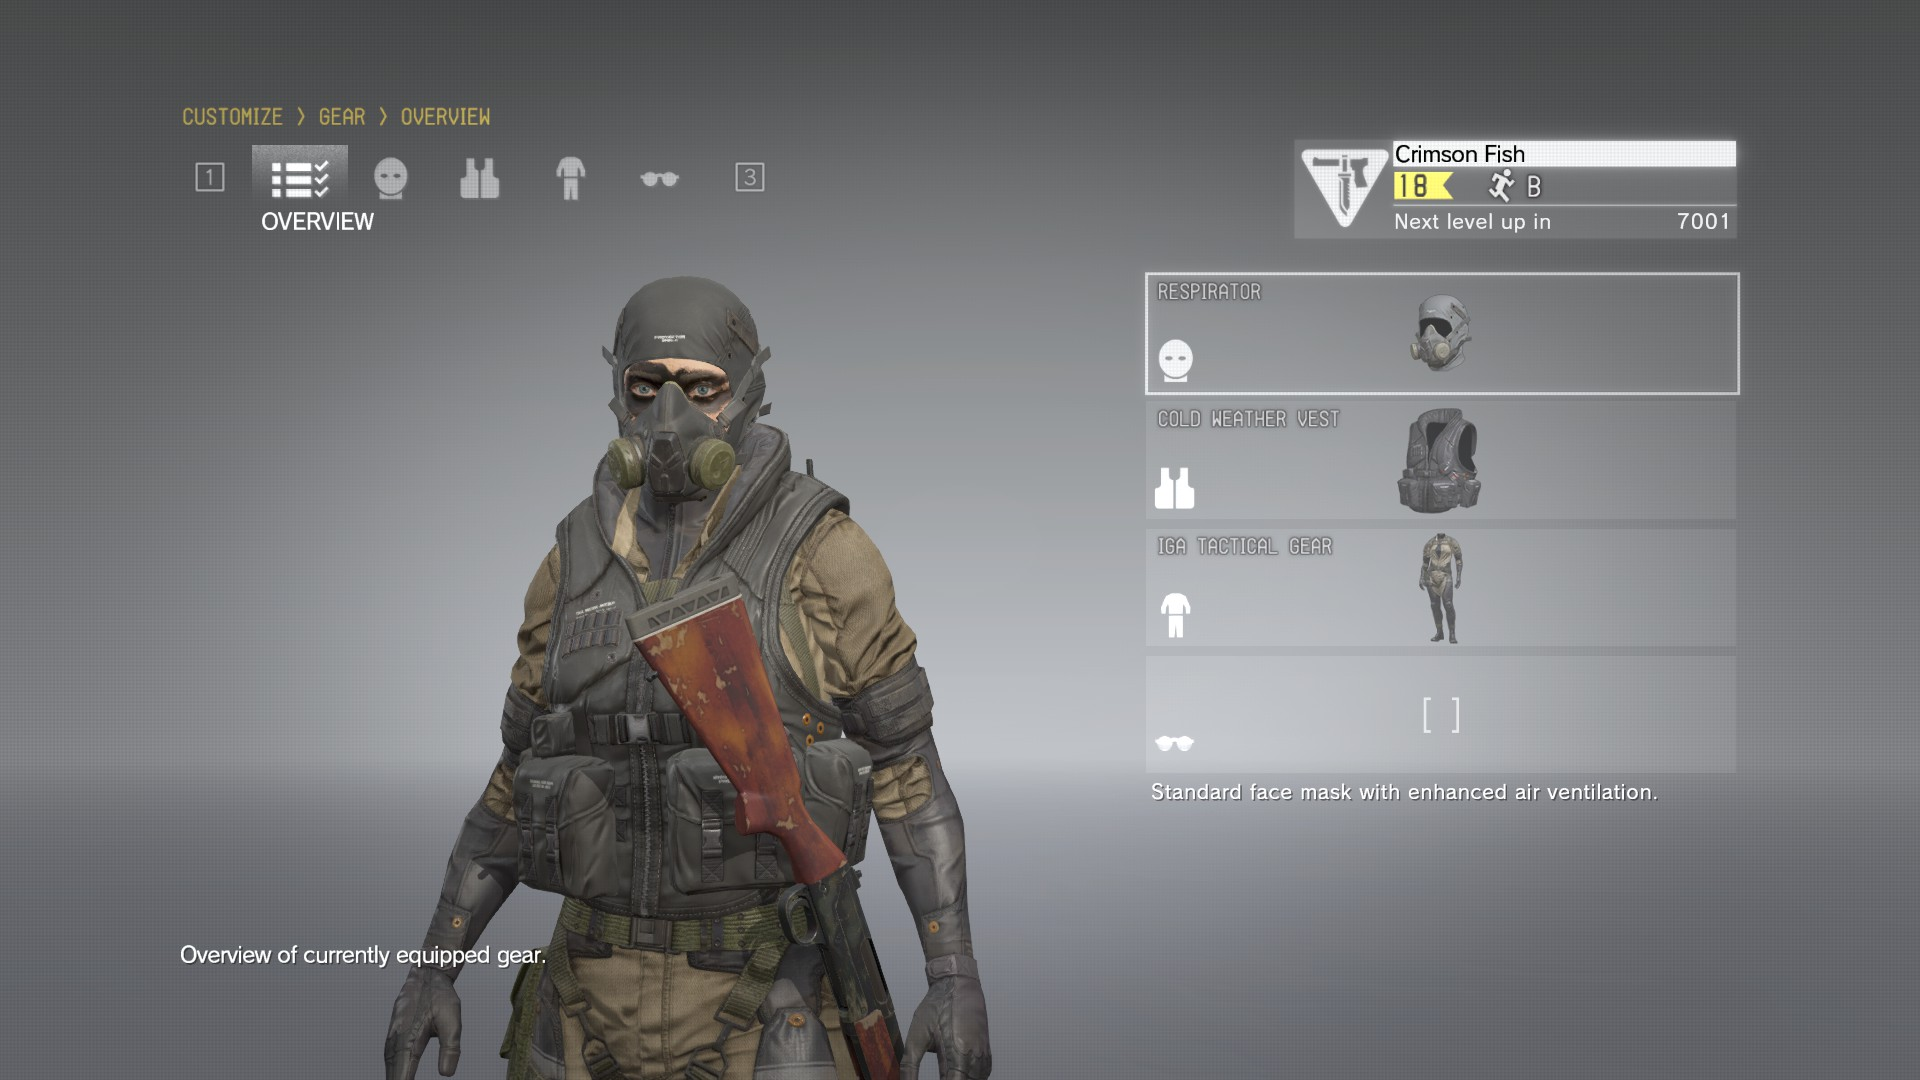 Metal Gear Solid - A Hideo Kojima Thread - A Pachinko